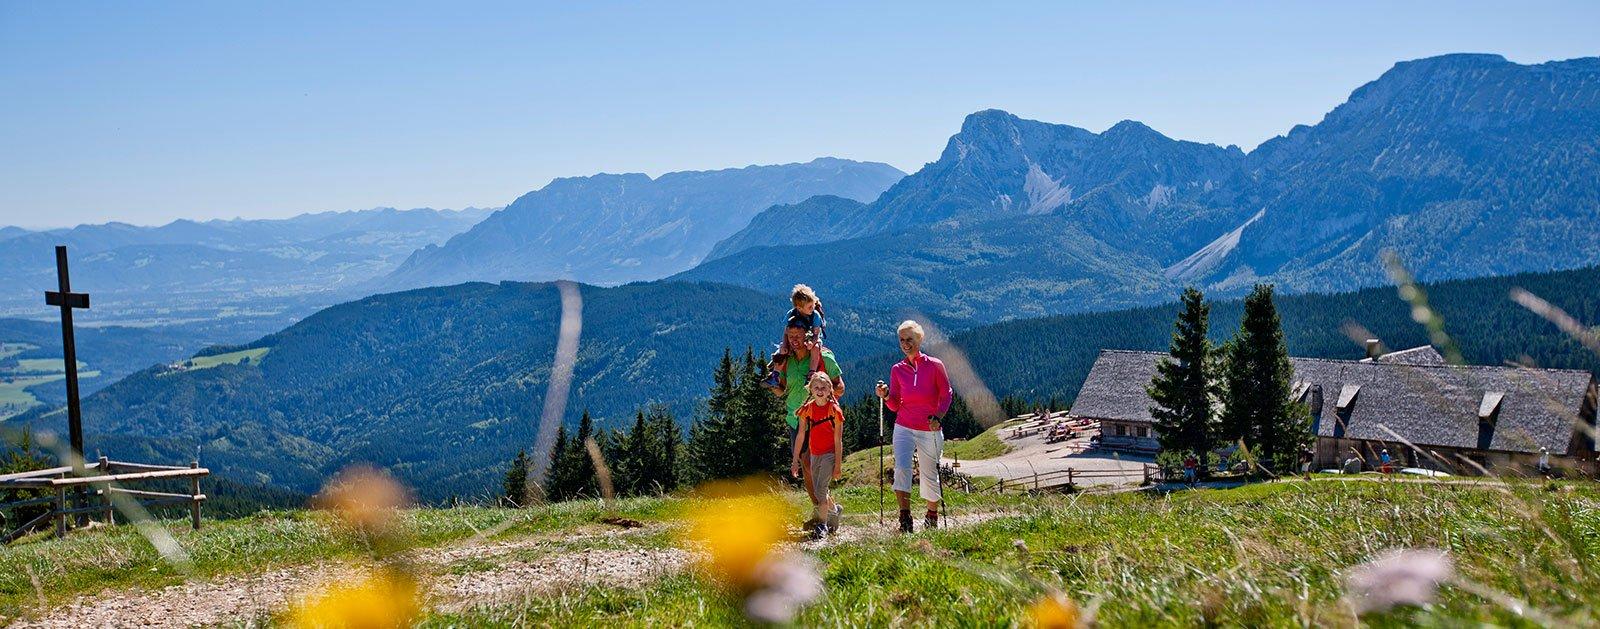 Familienwanderung mit Bergpanorama